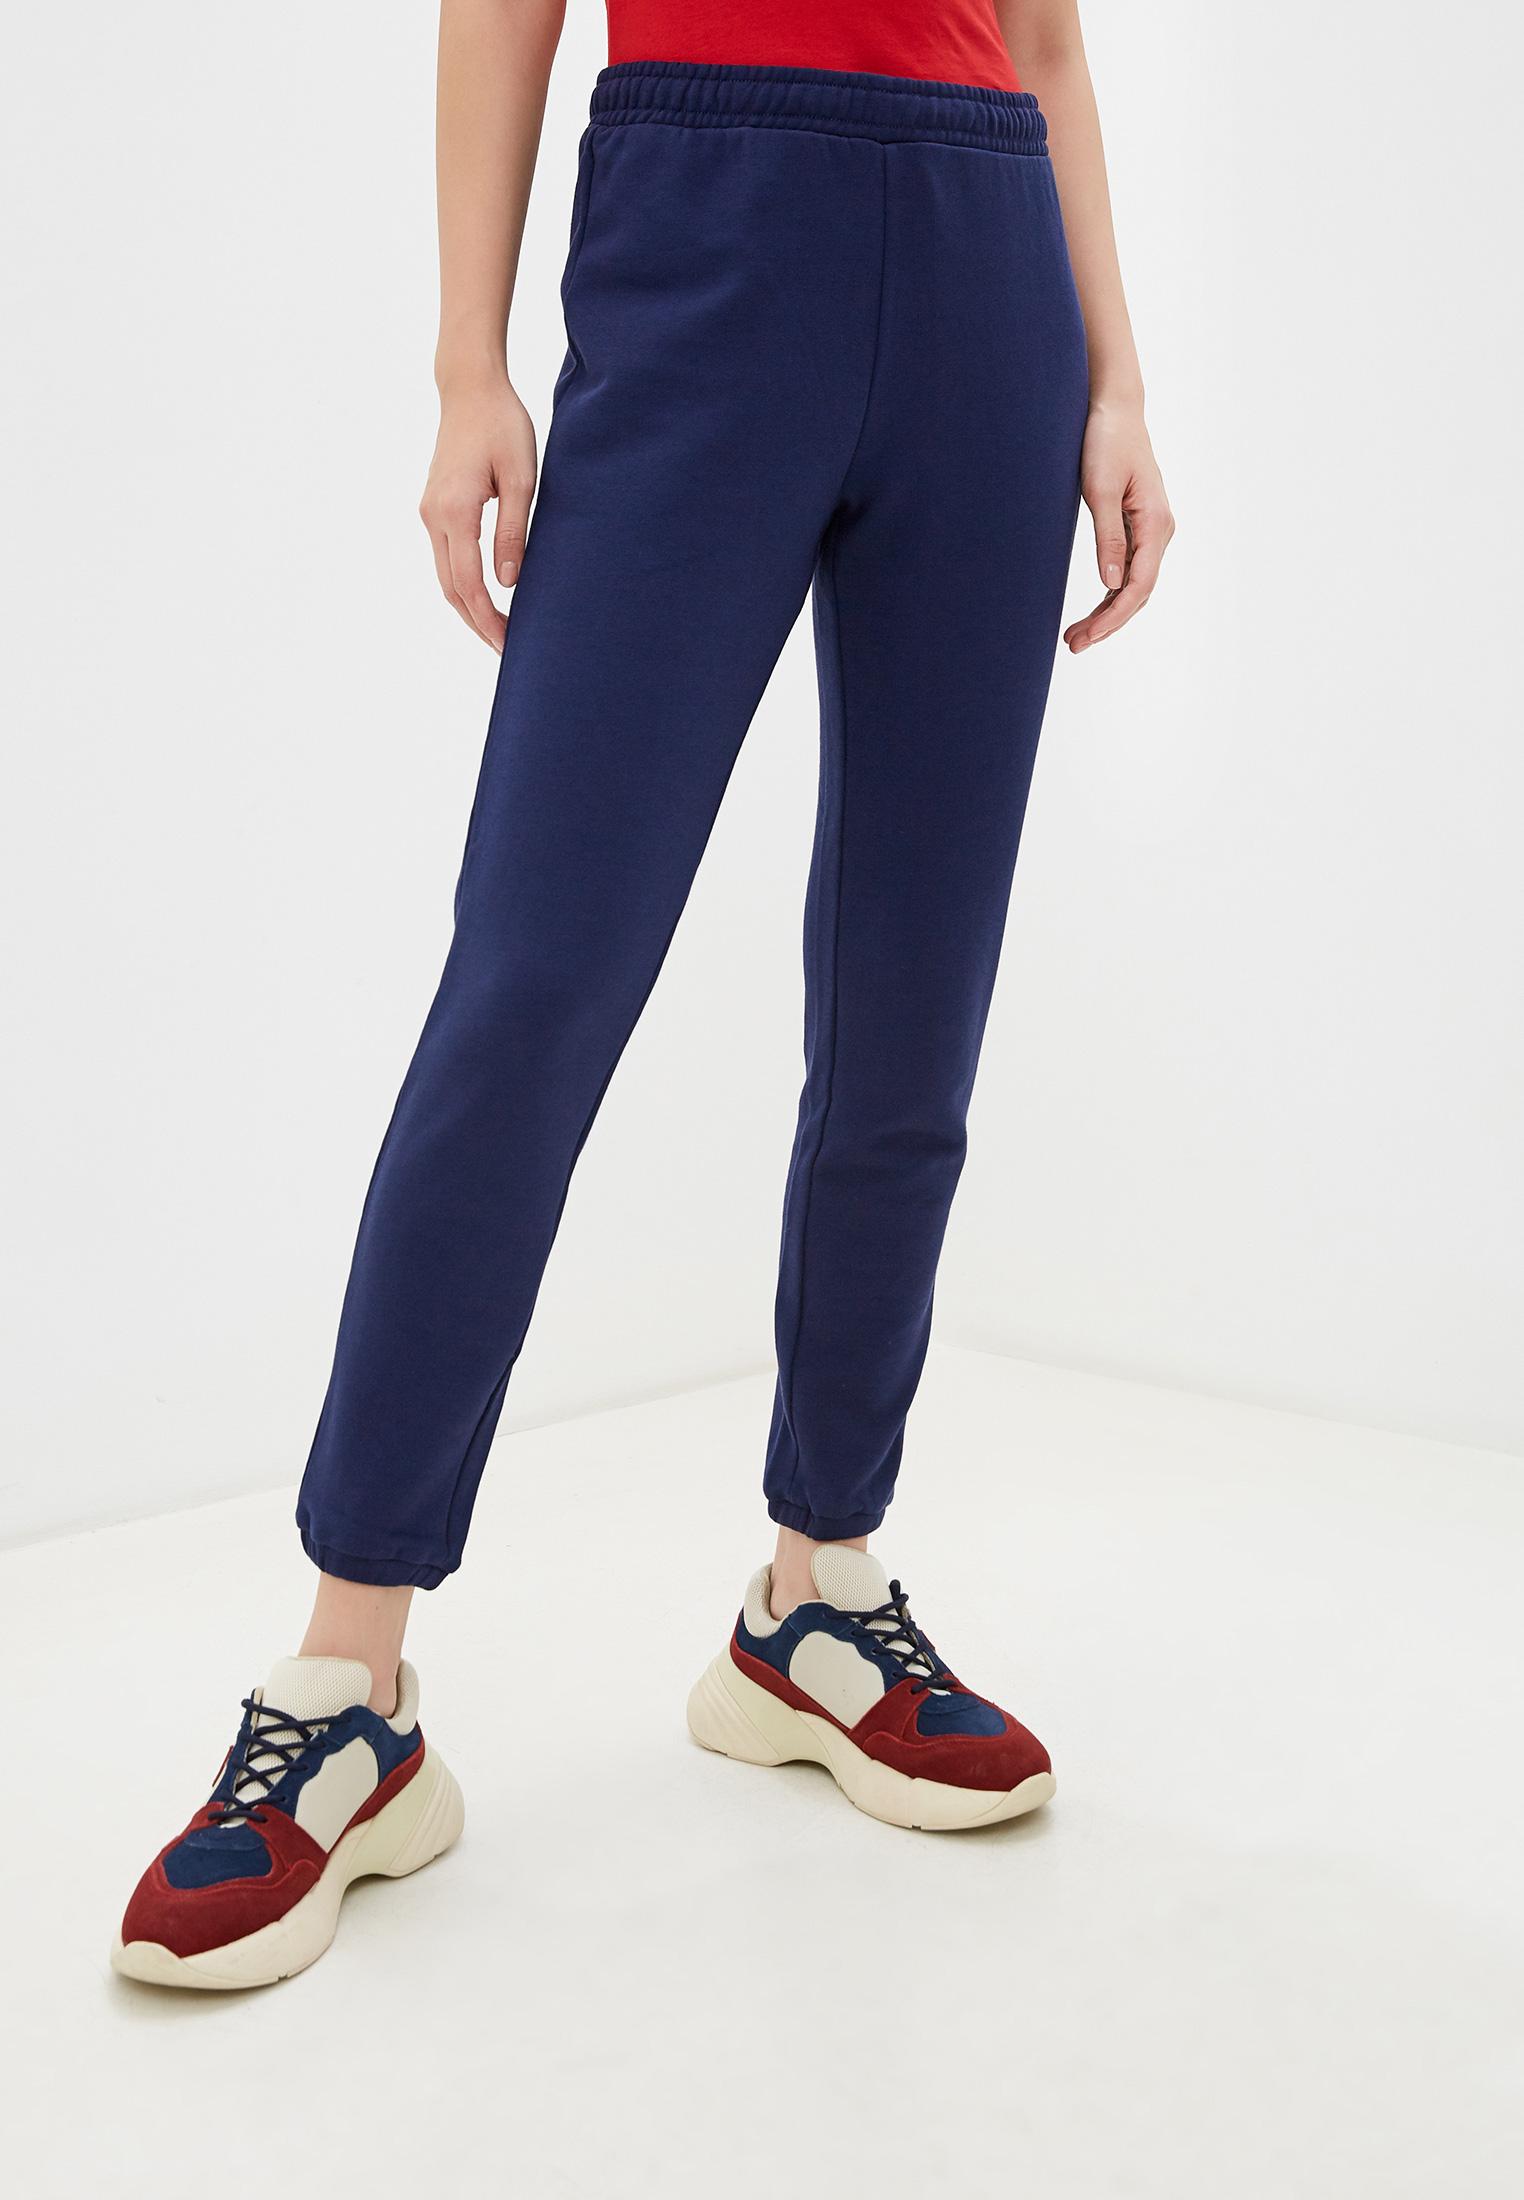 Женские спортивные брюки Love Moschino W 1 486 01 M 4068